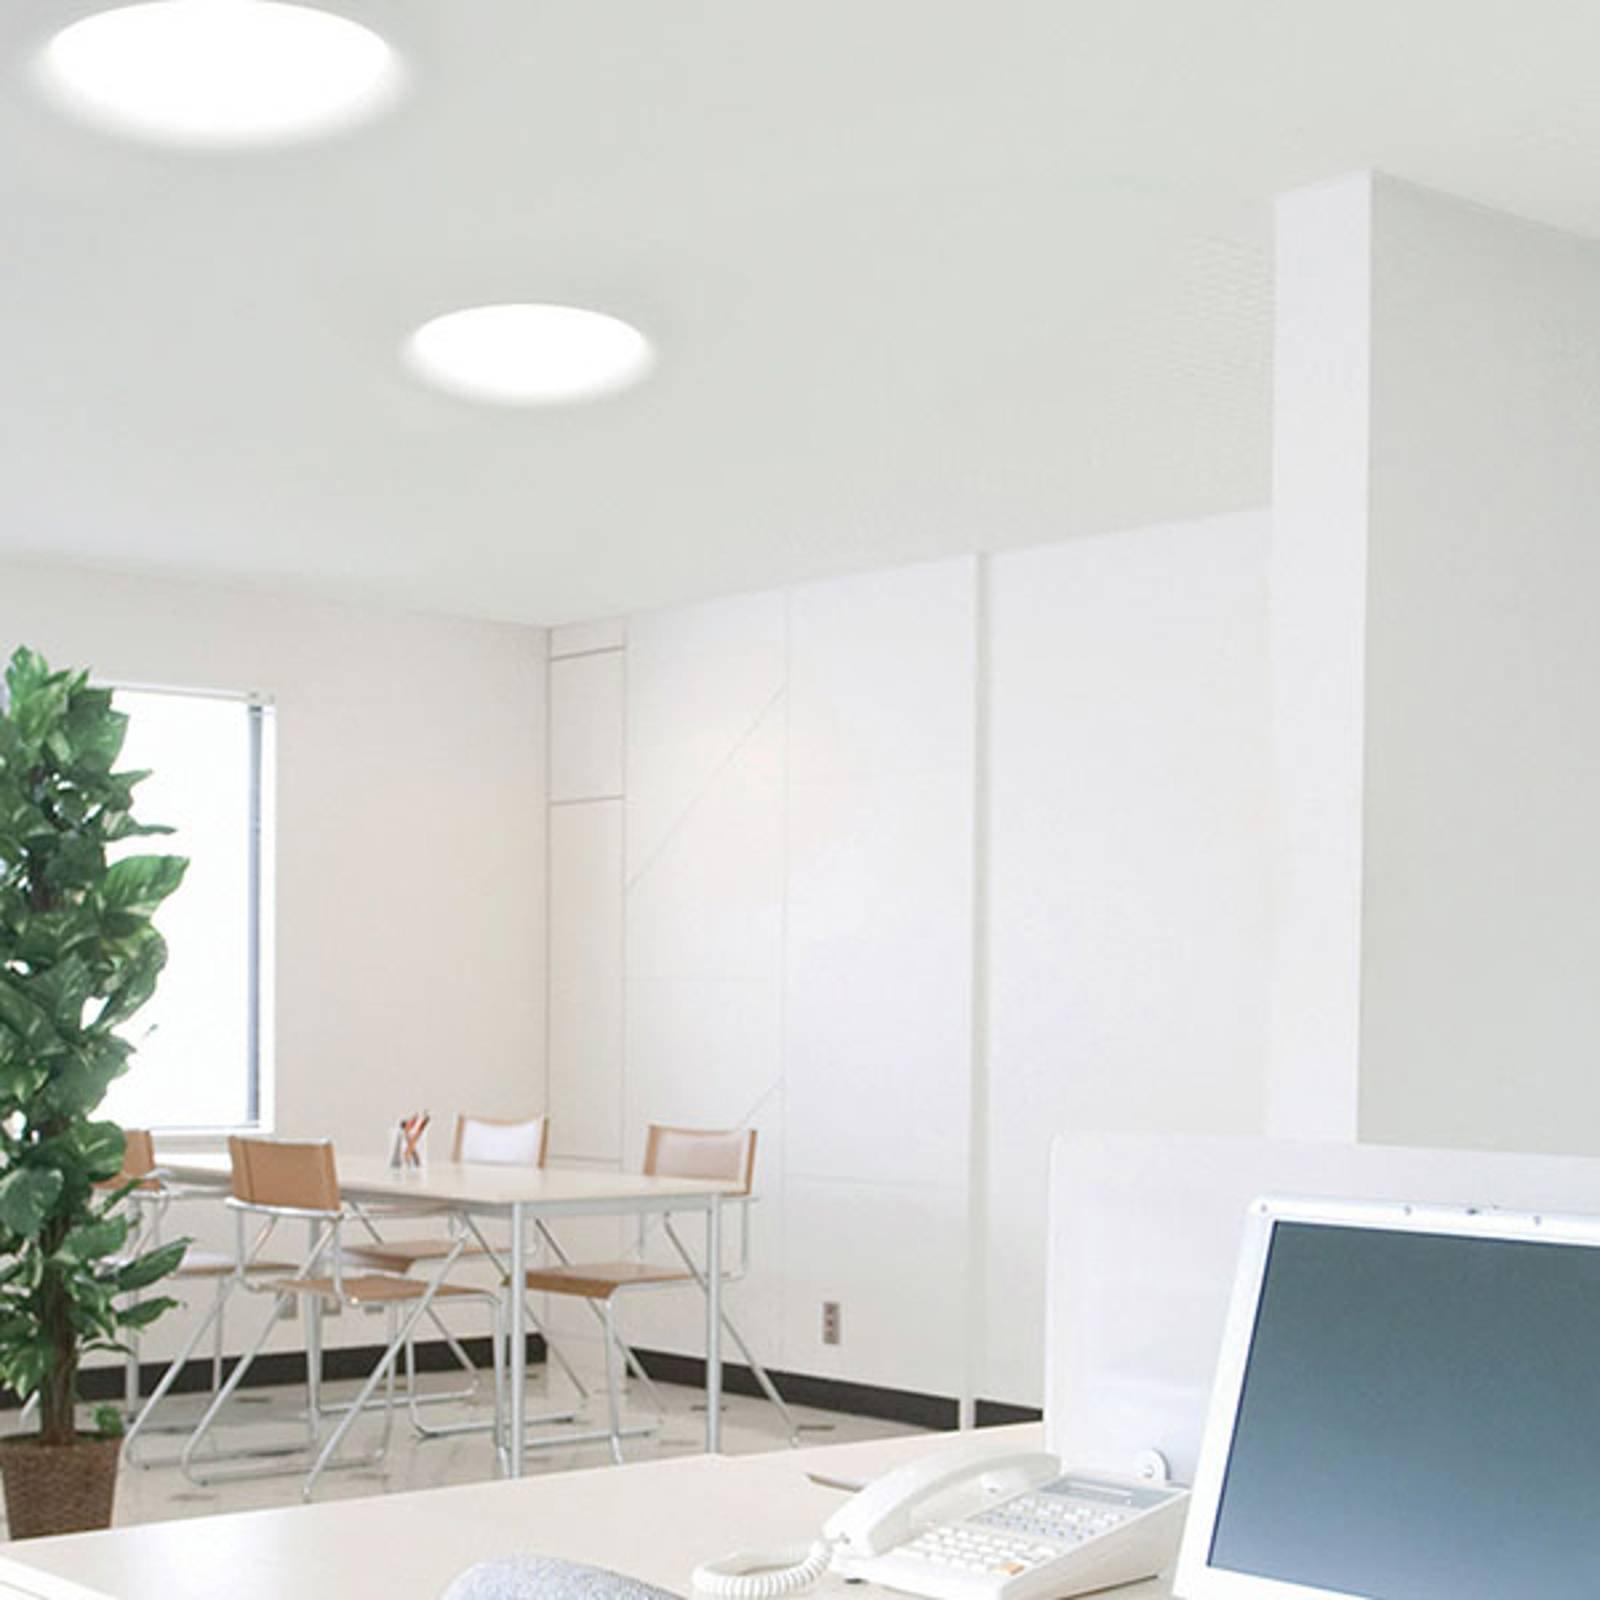 Innbygget LED-taklampe 4113B 2 700 K 37W Ø44,5 cm